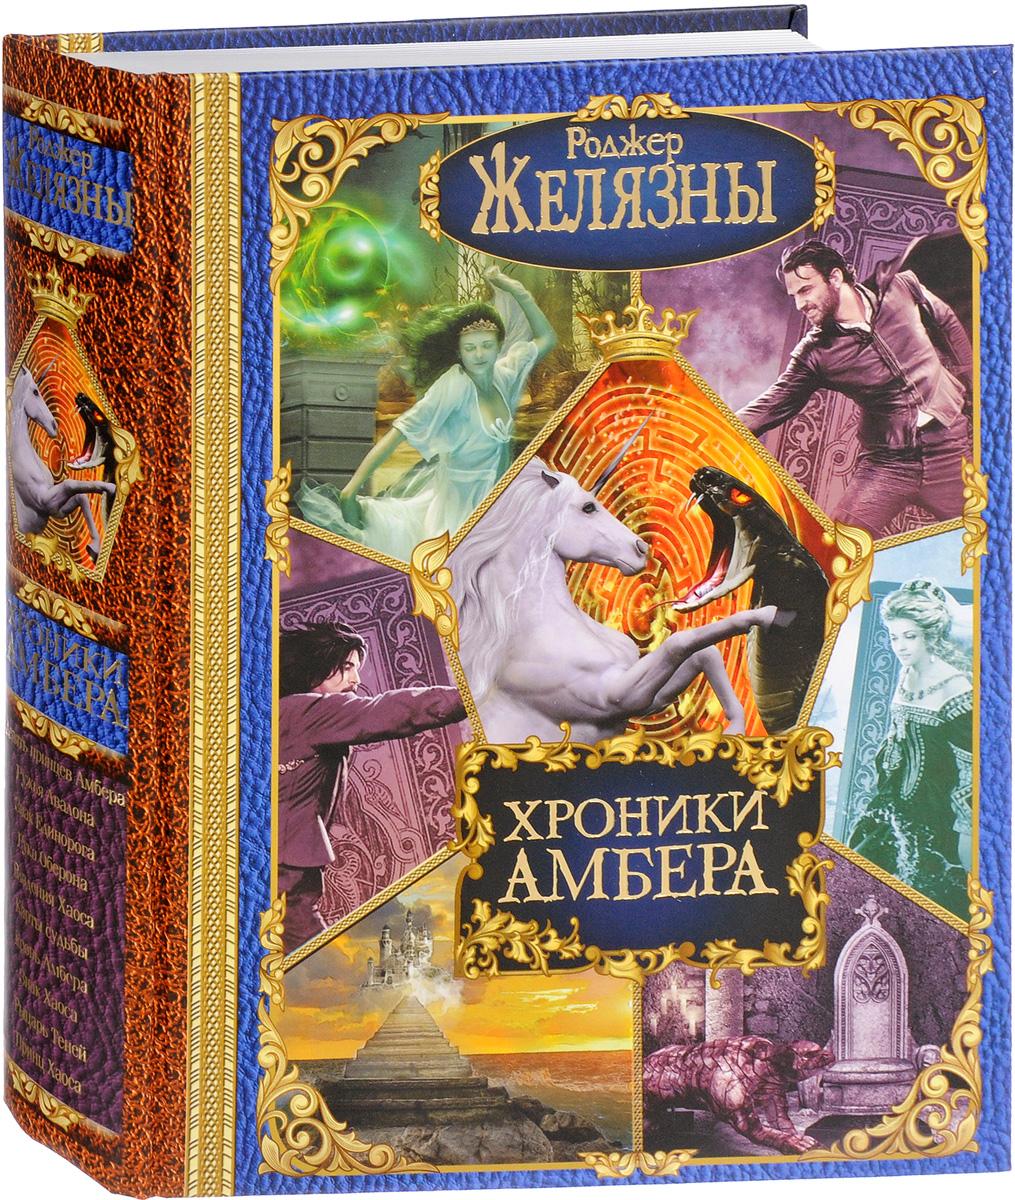 Желязны Роджер Хроники Амбера. Книги Корвина. Книги Мерлина